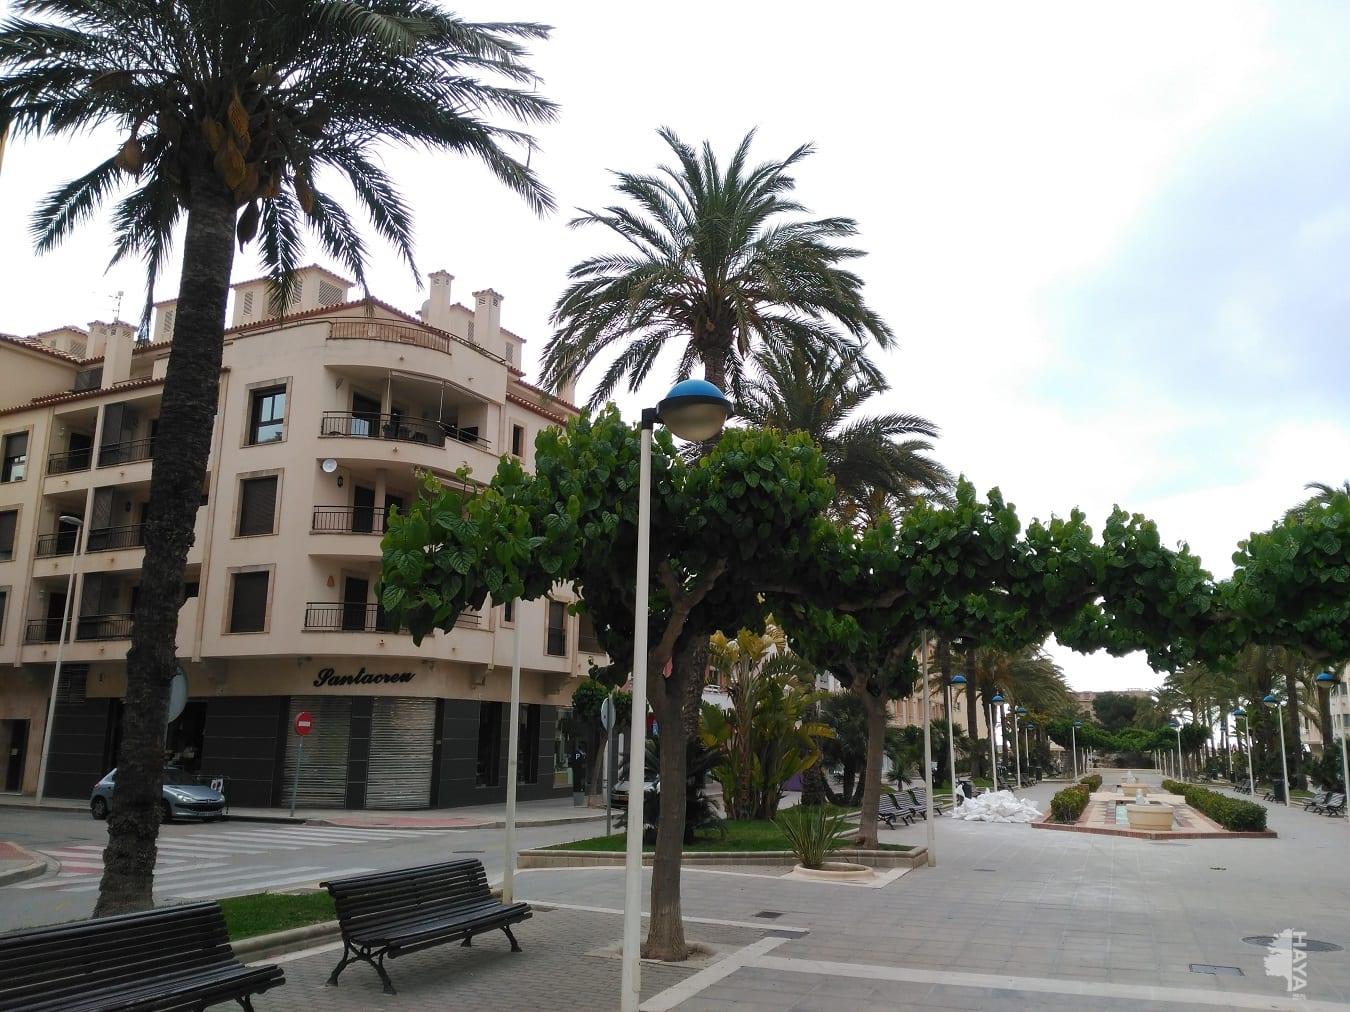 Piso en venta en Moraira, Teulada, Alicante, Calle Marjeleta, 143.000 €, 1 habitación, 1 baño, 61 m2